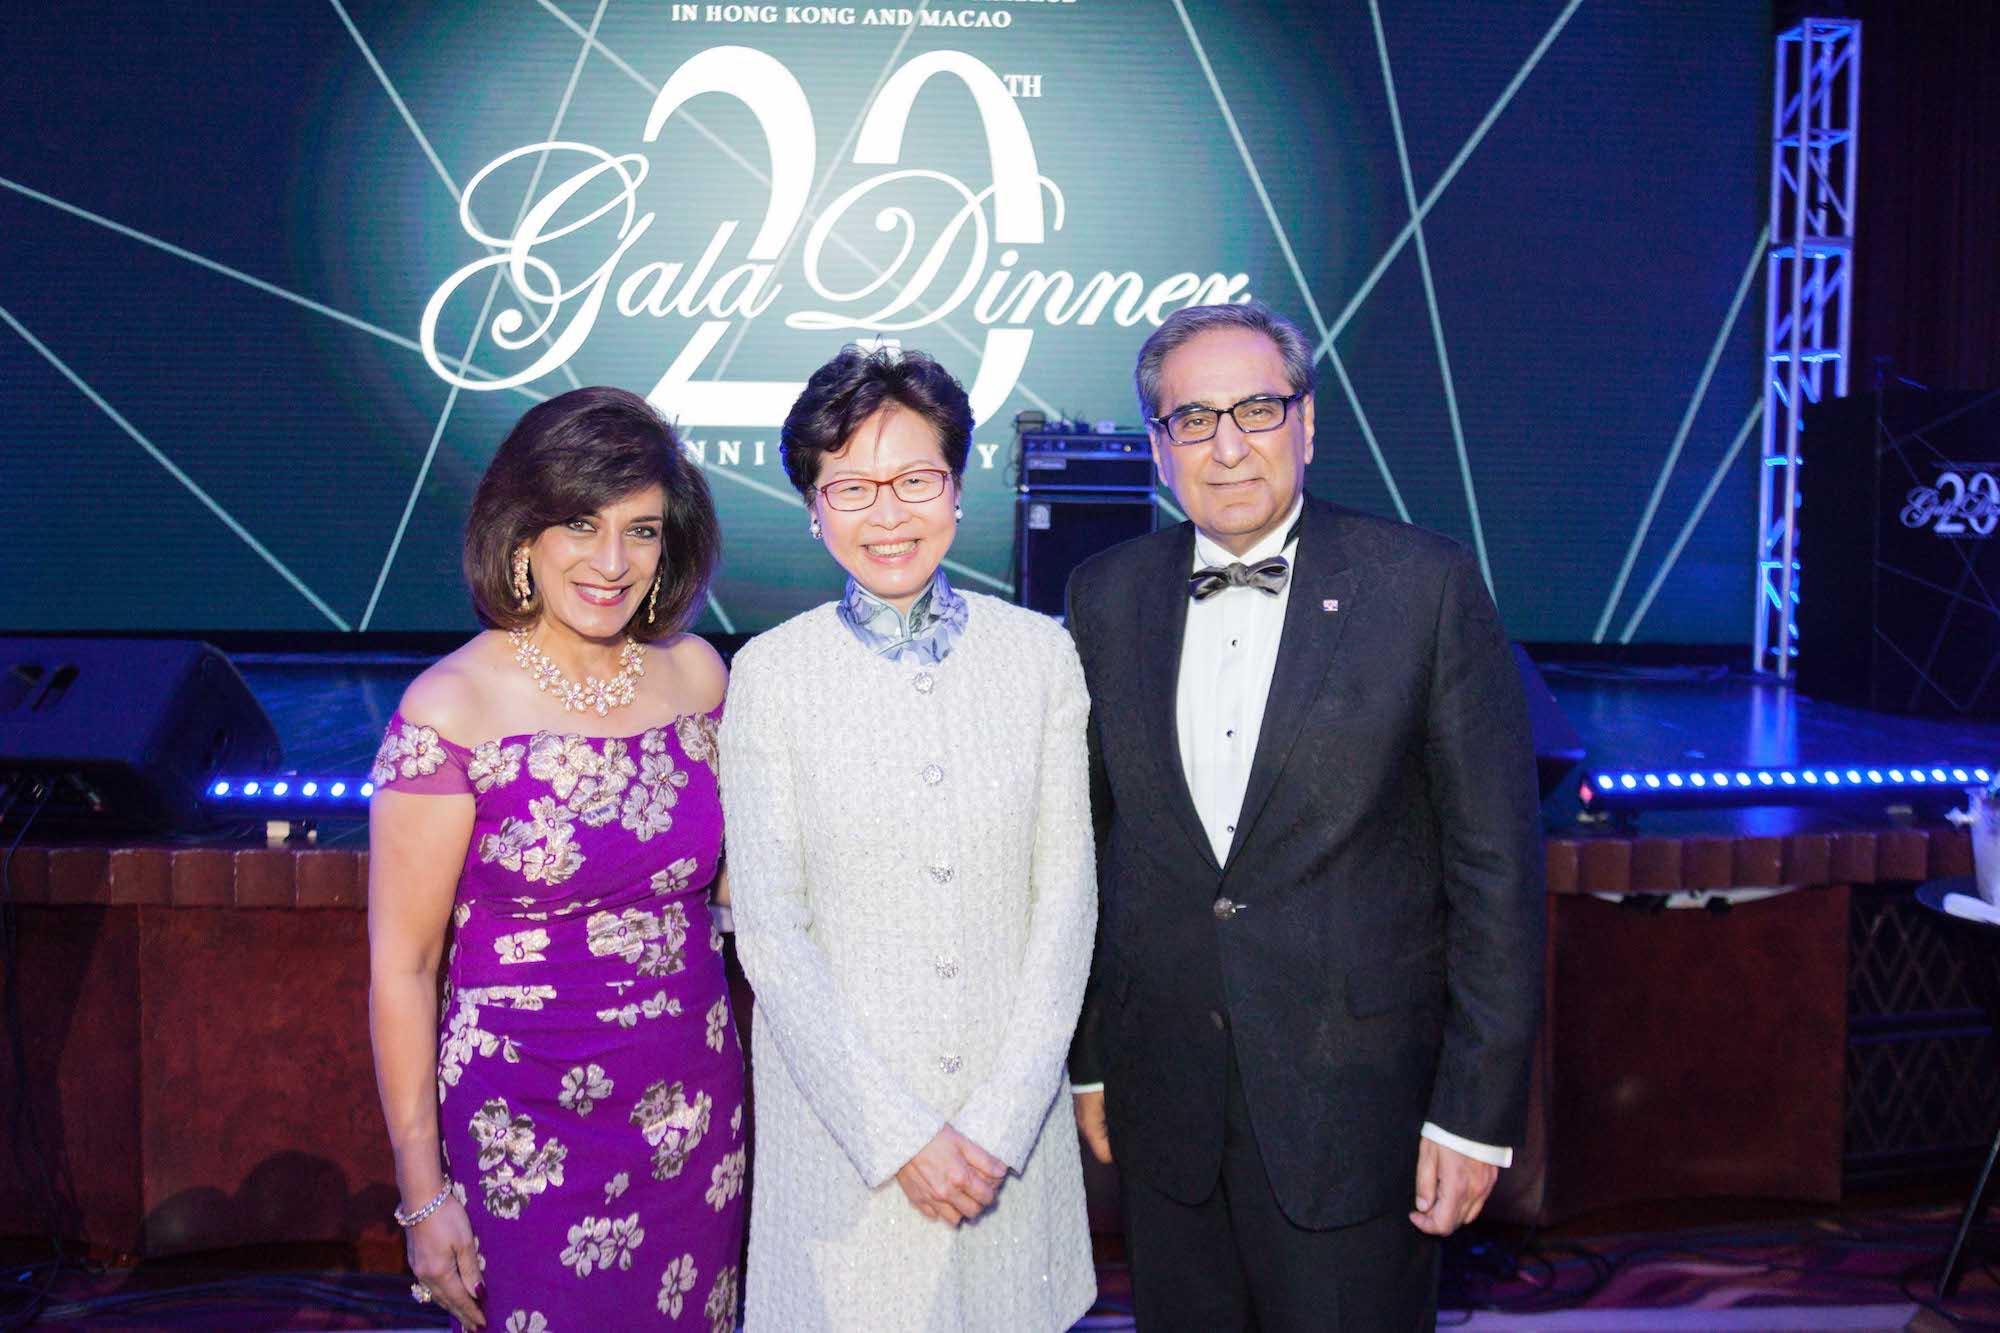 Avisha Harilela, Carrie Lam, David Harilela